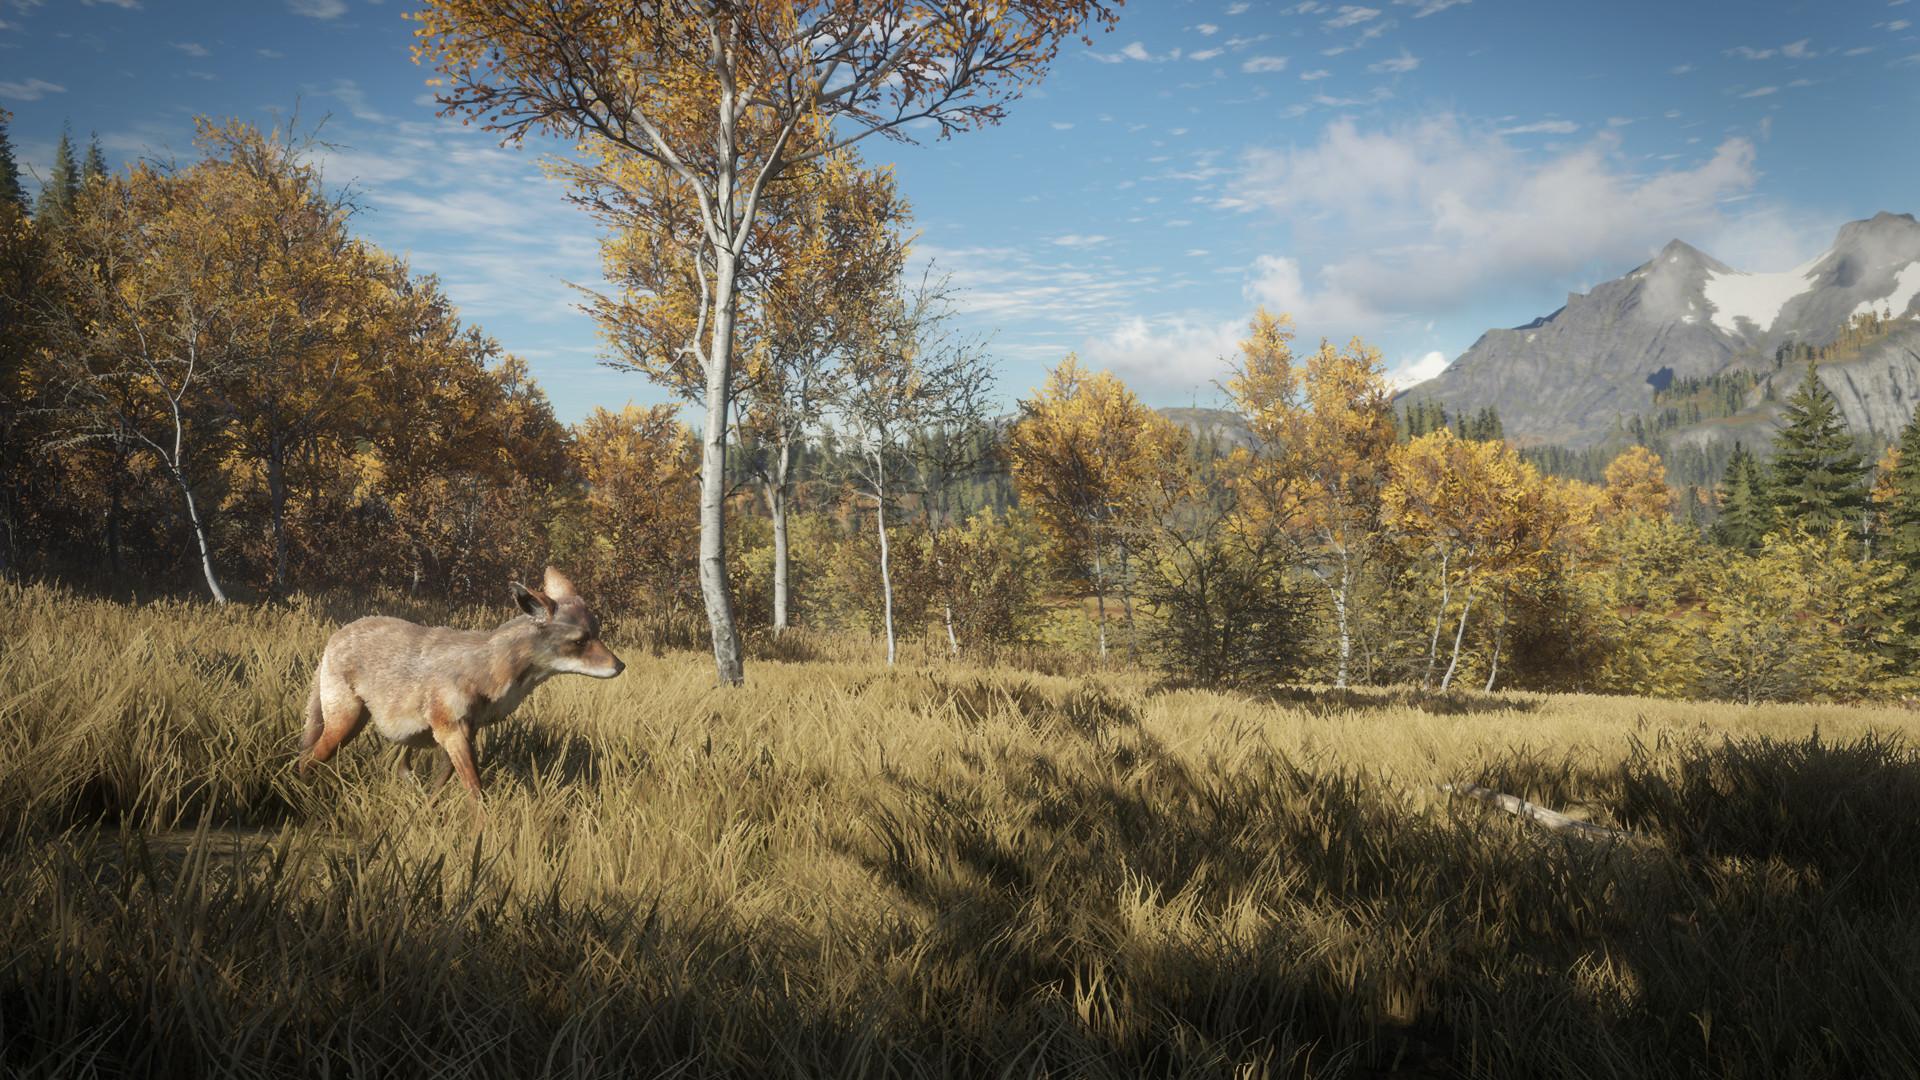 Yarrid henrard coyote field